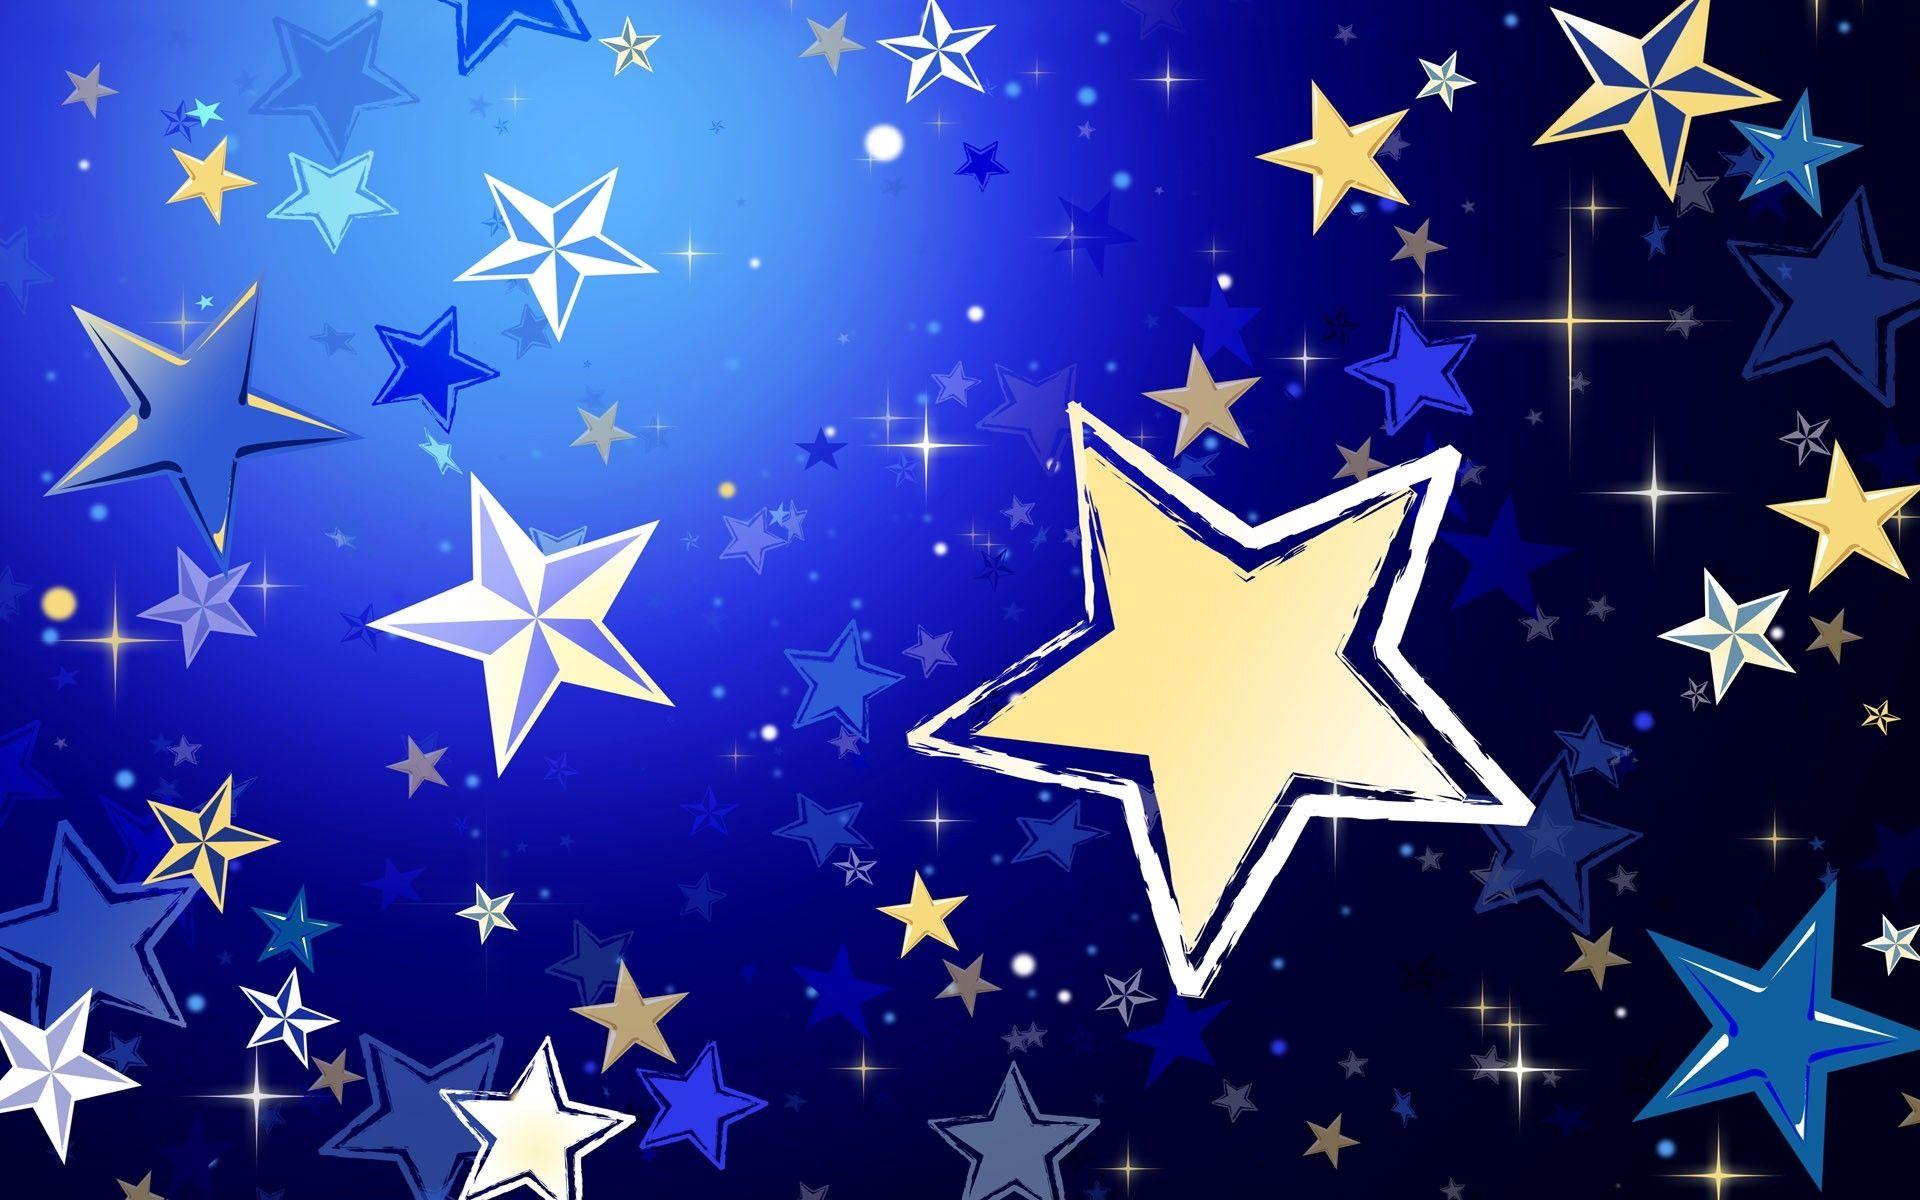 Звезды поздравляют открытка, открытки йорками картинки